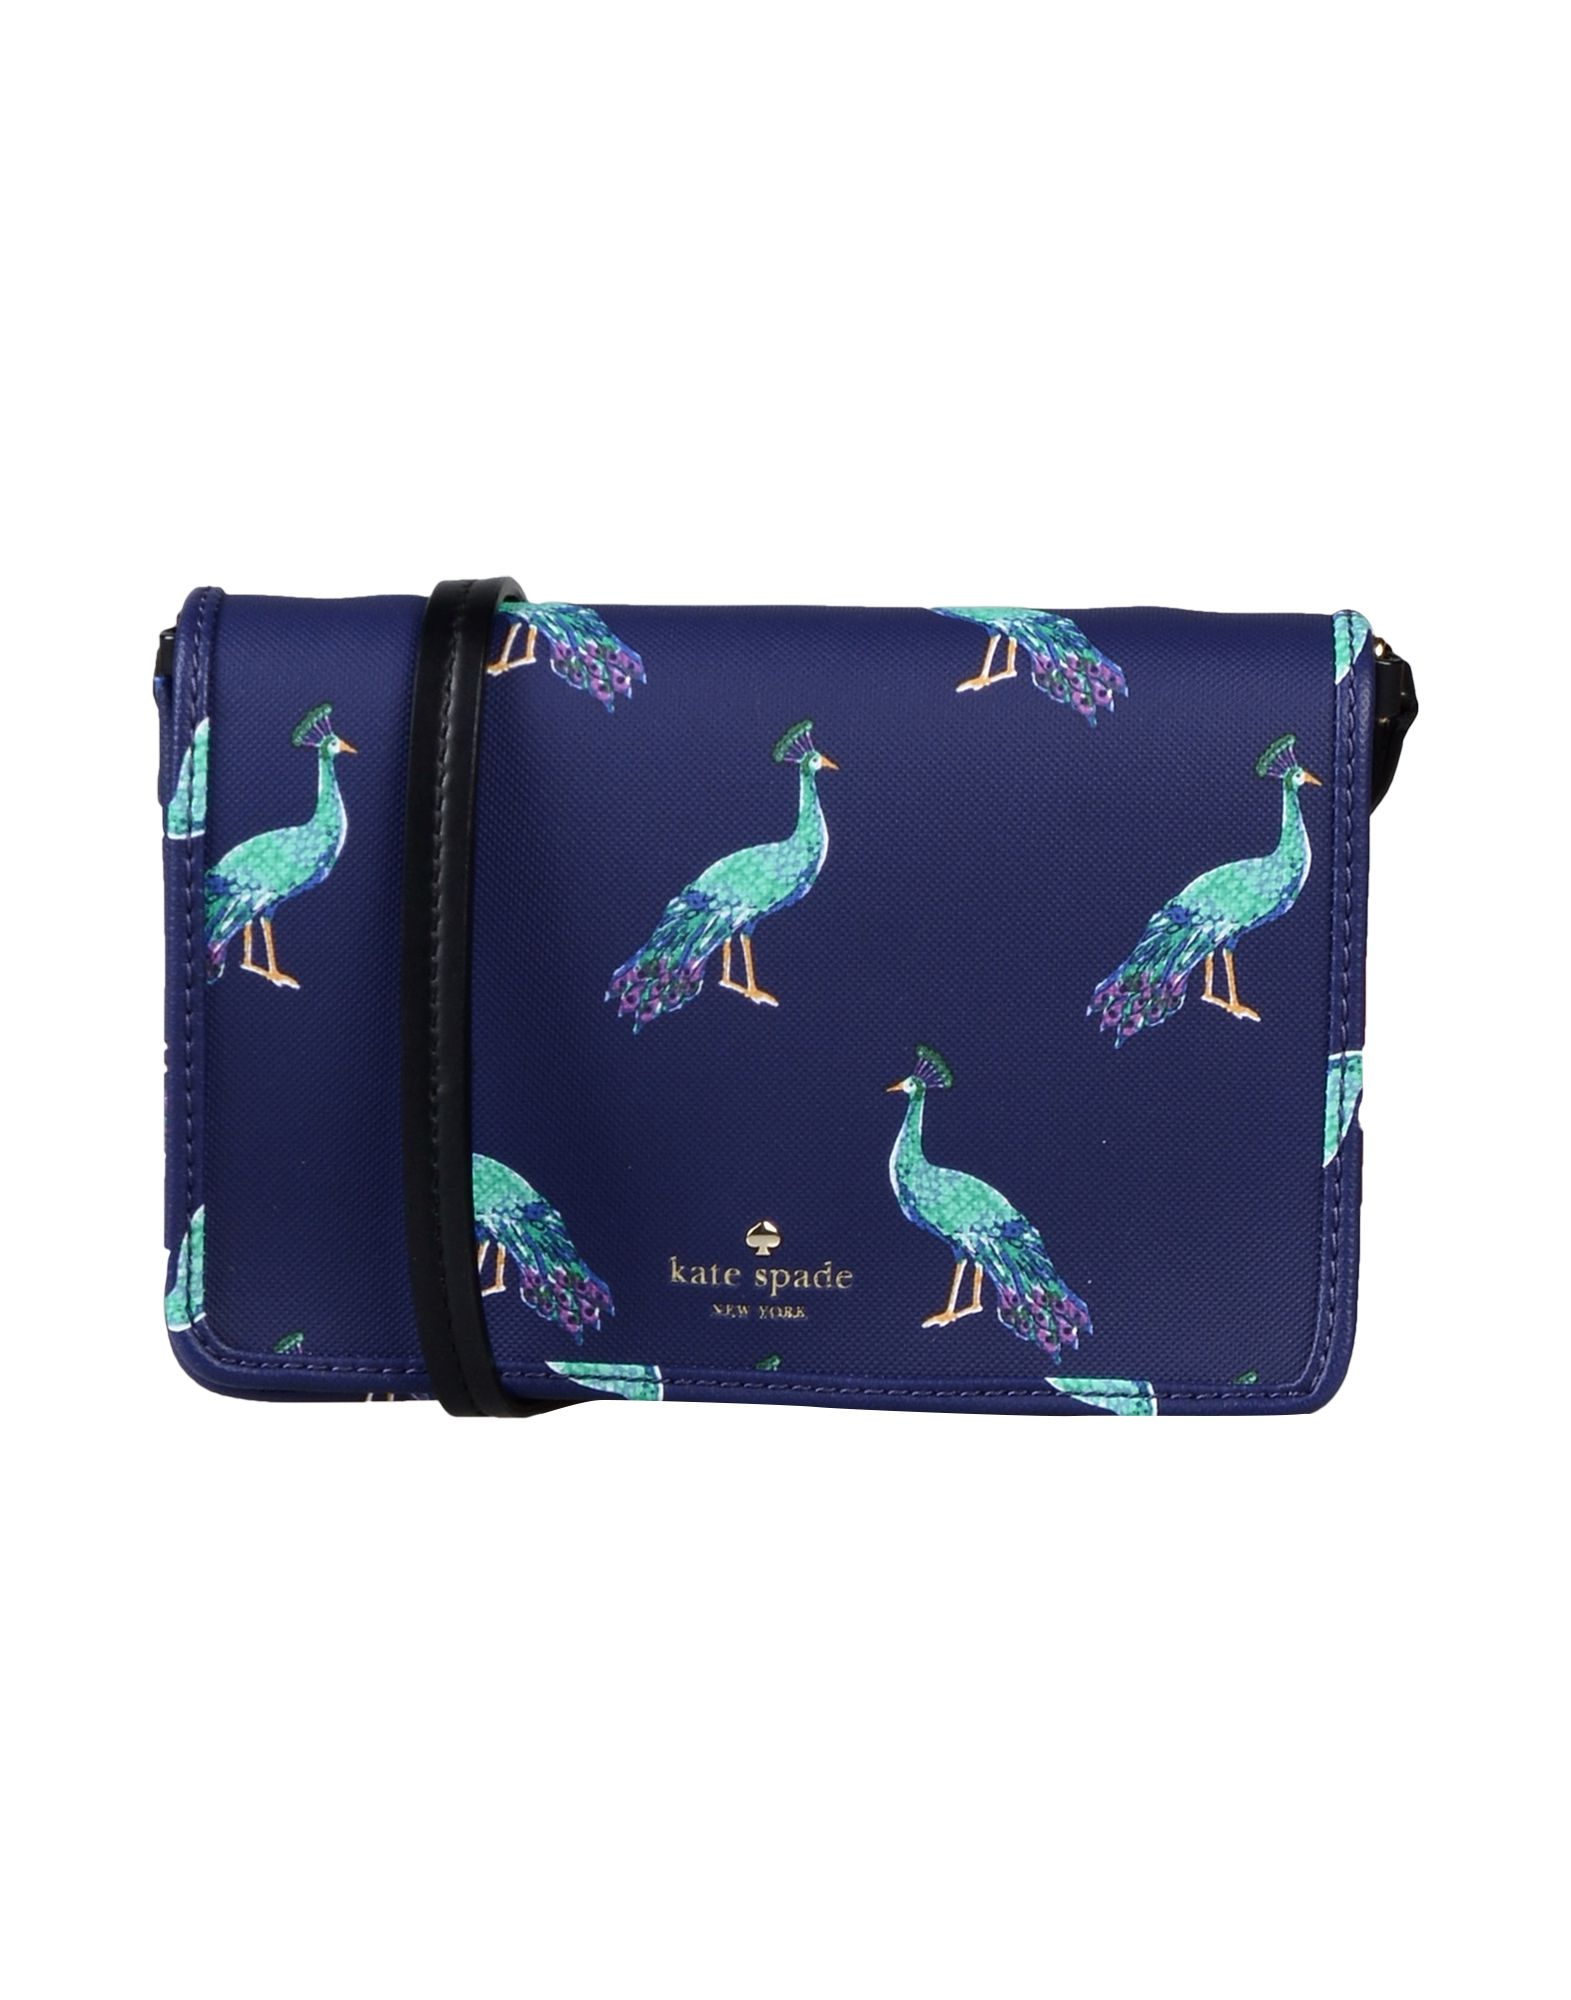 KATE SPADE New York Сумка через плечо сумка через плечо brand new 2015 rhnwb0001